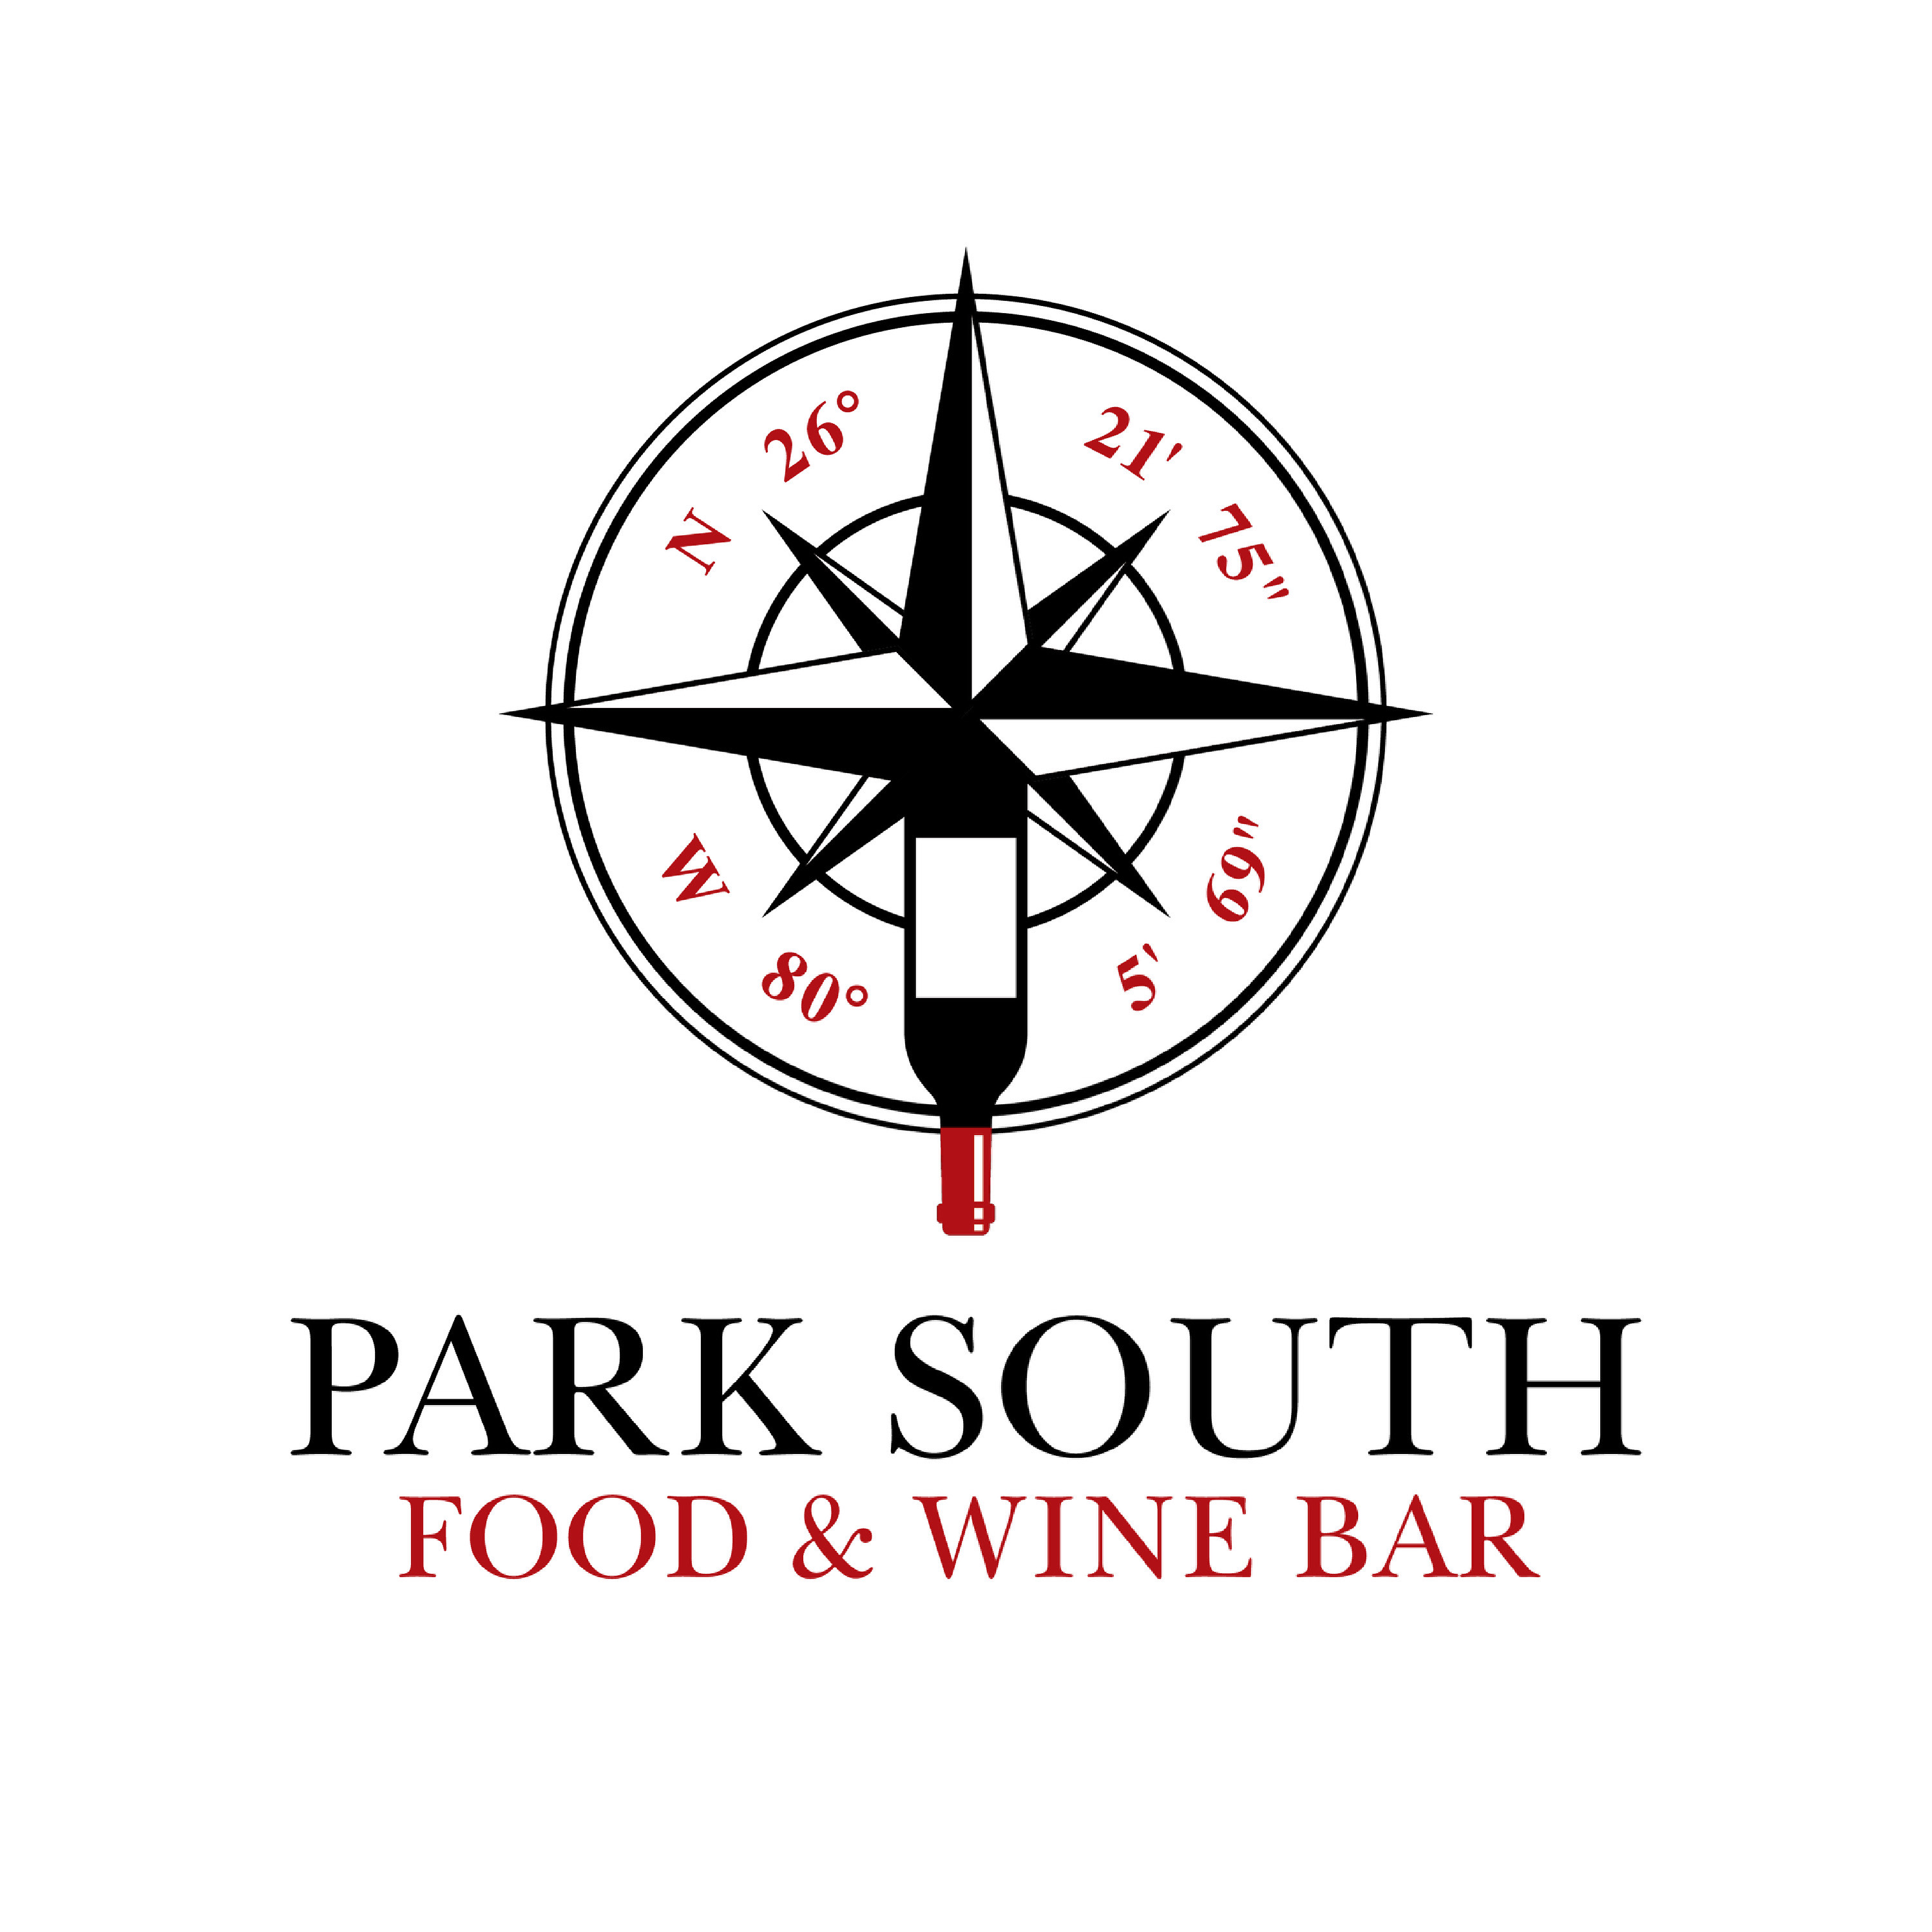 Park South Food & Wine Bar Home